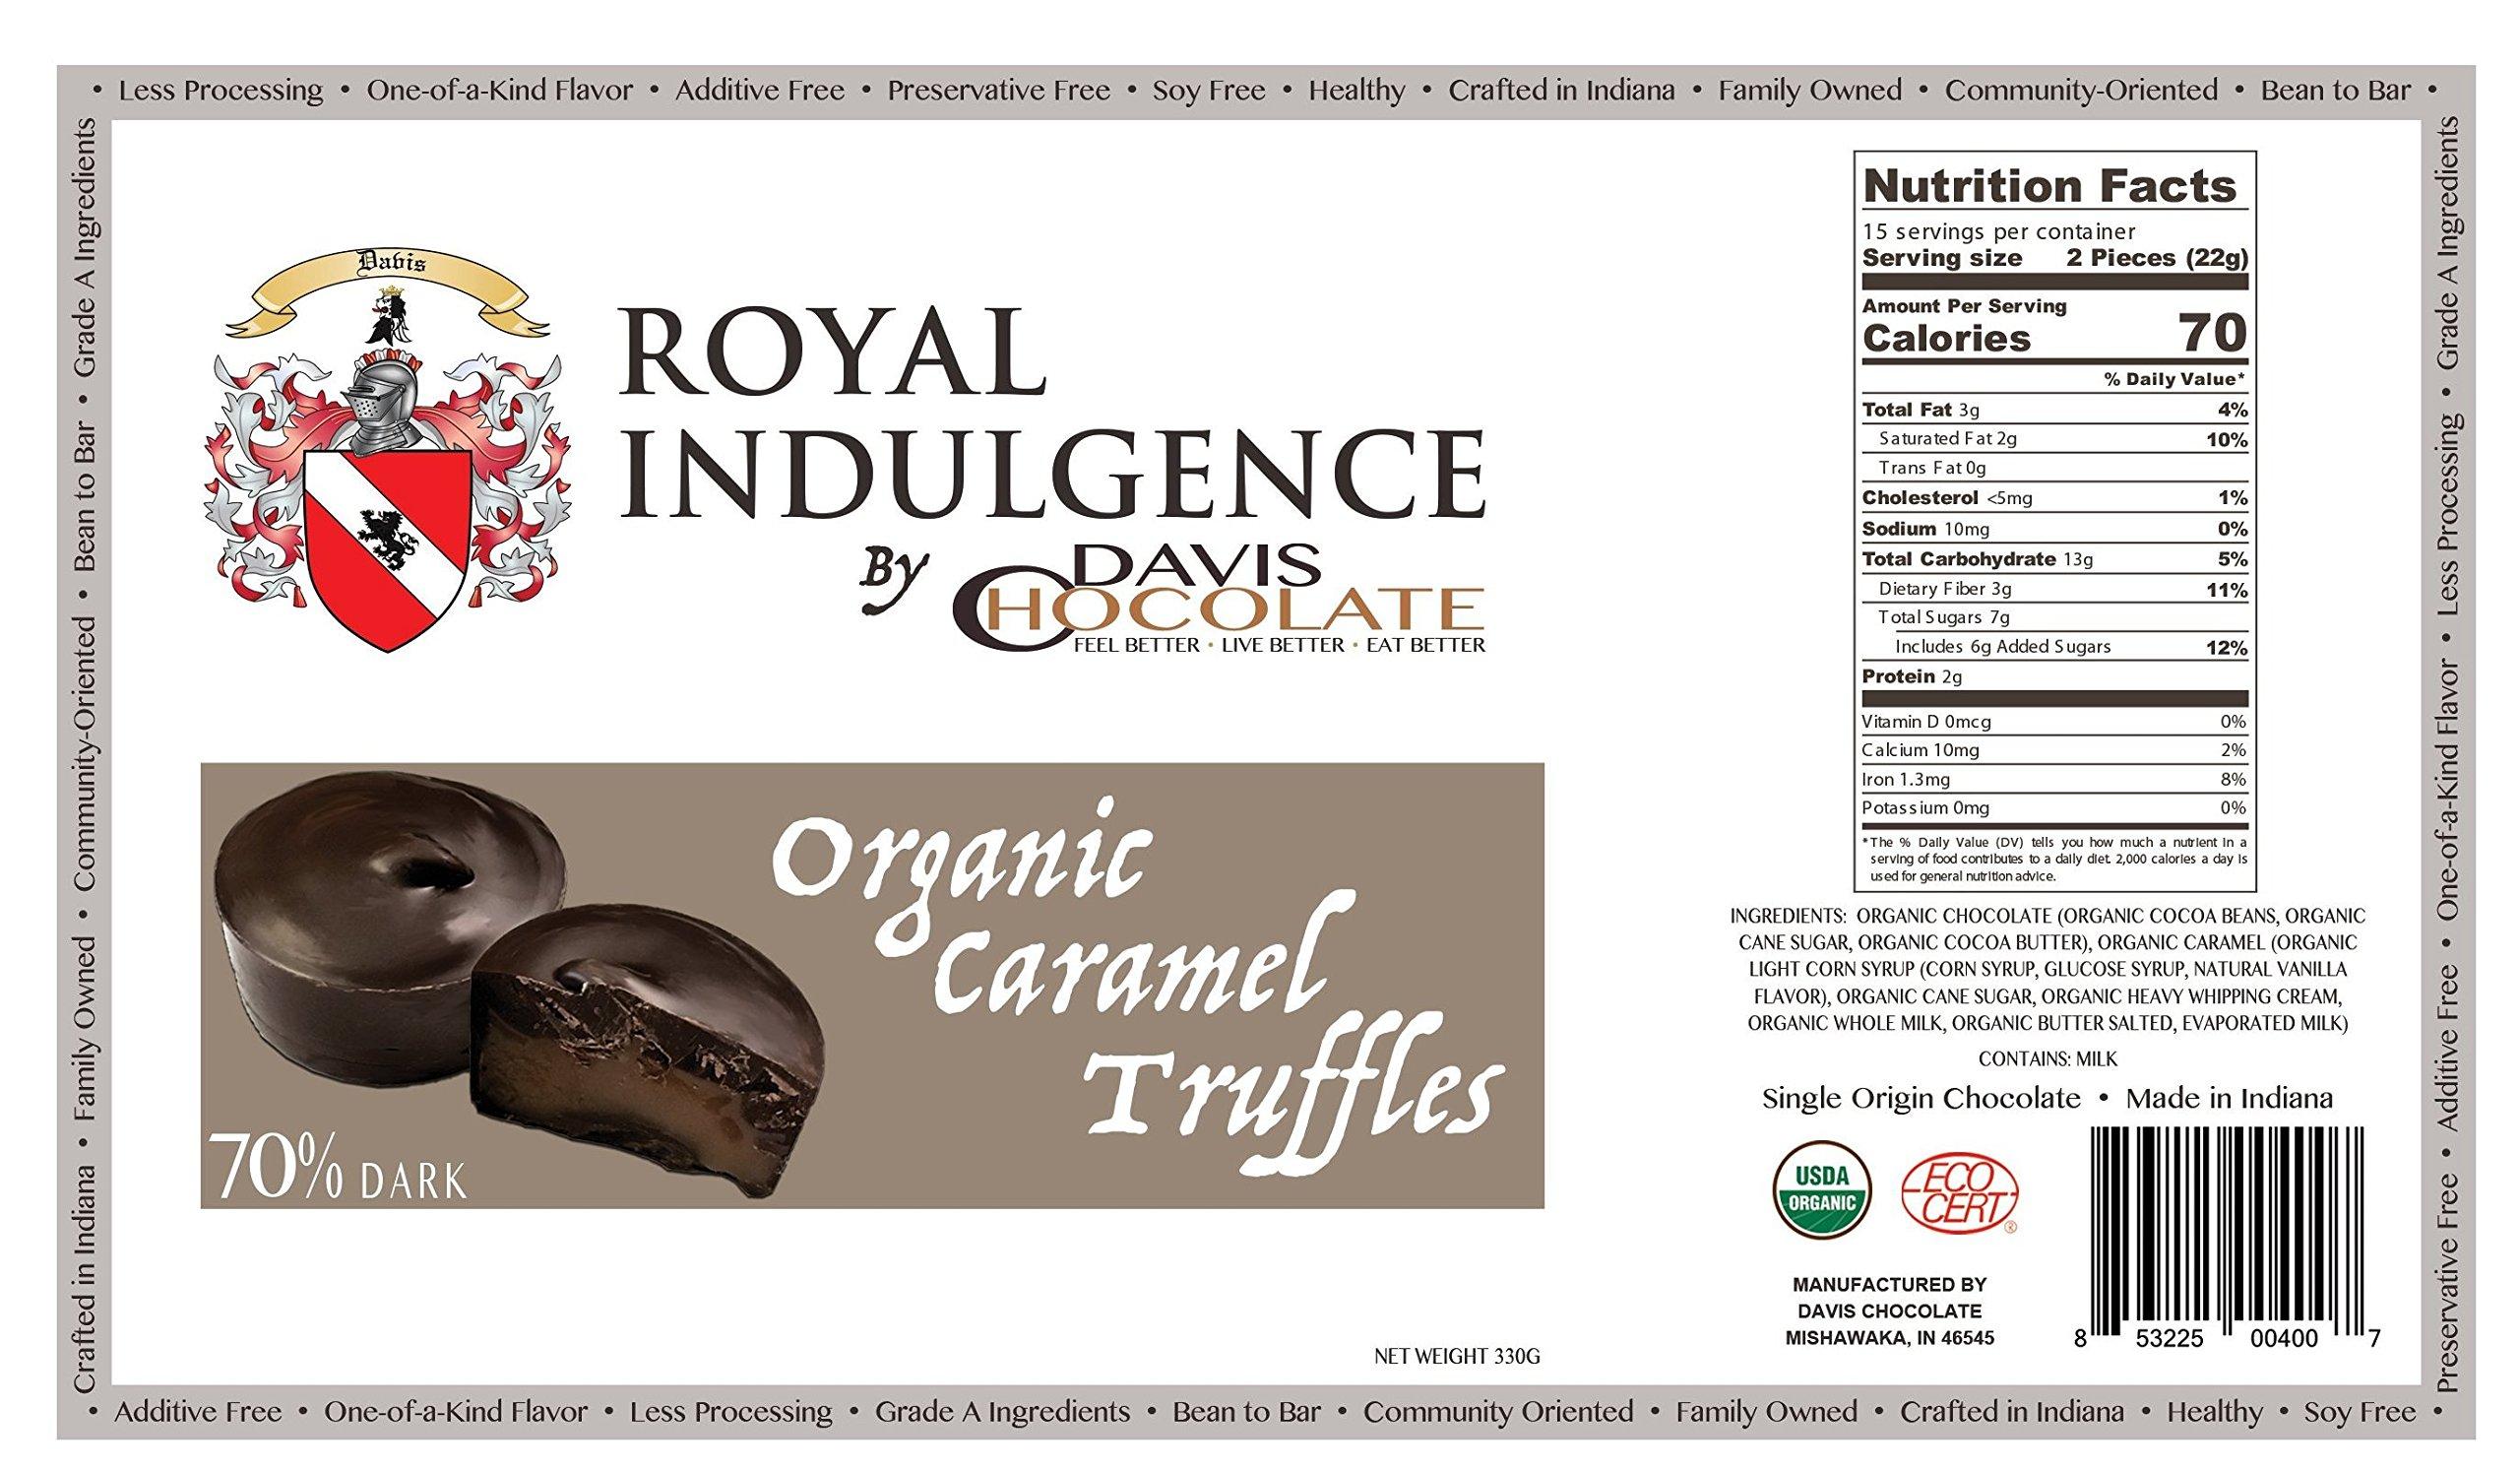 Royal Indulgence 70% DARK CHOCOLATE ORGANIC PEANUT BUTTER TRUFFLES